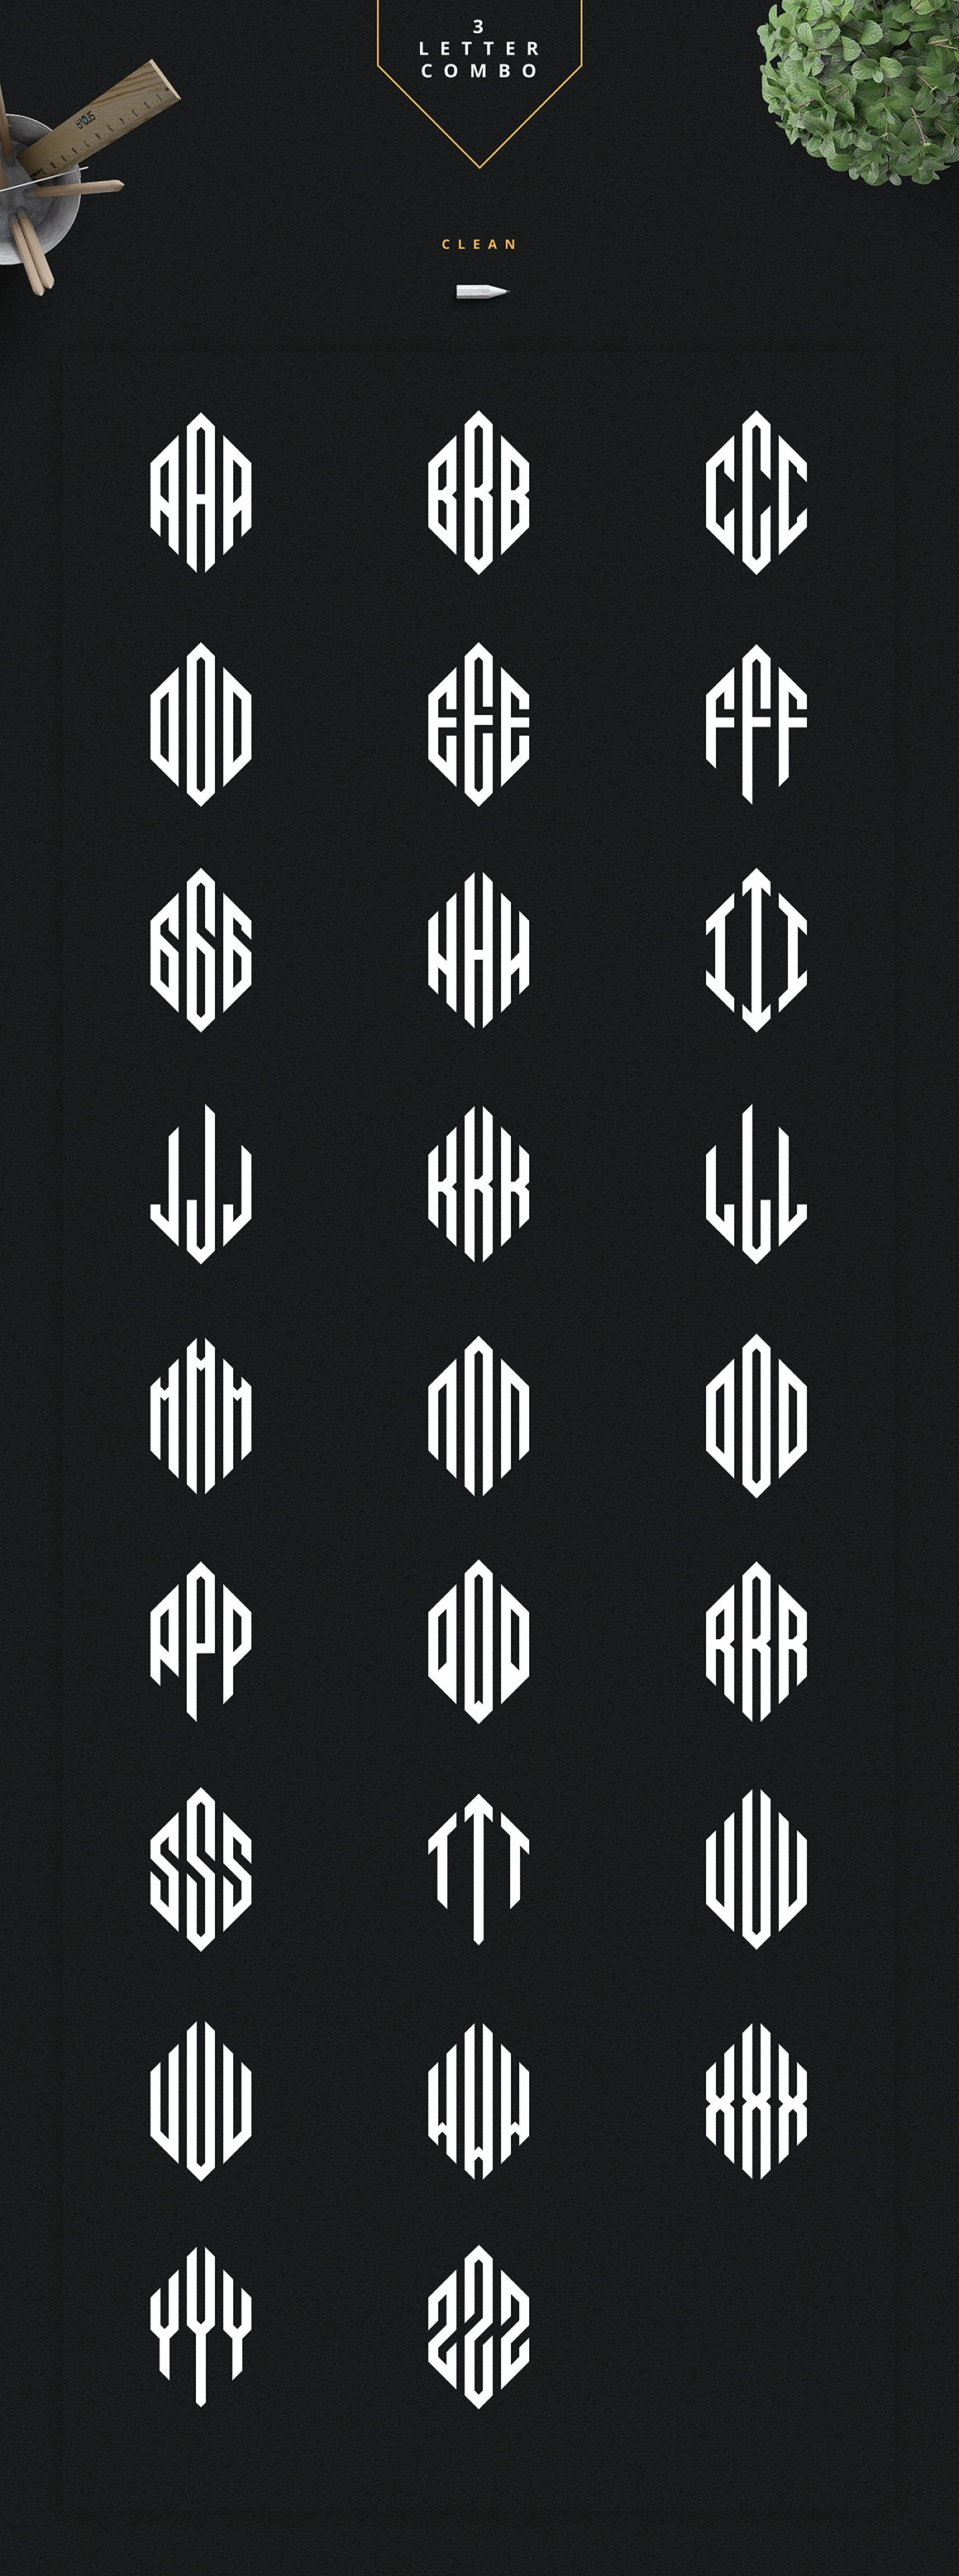 6in1-Ultimate-Monogram-creator-08.jpg